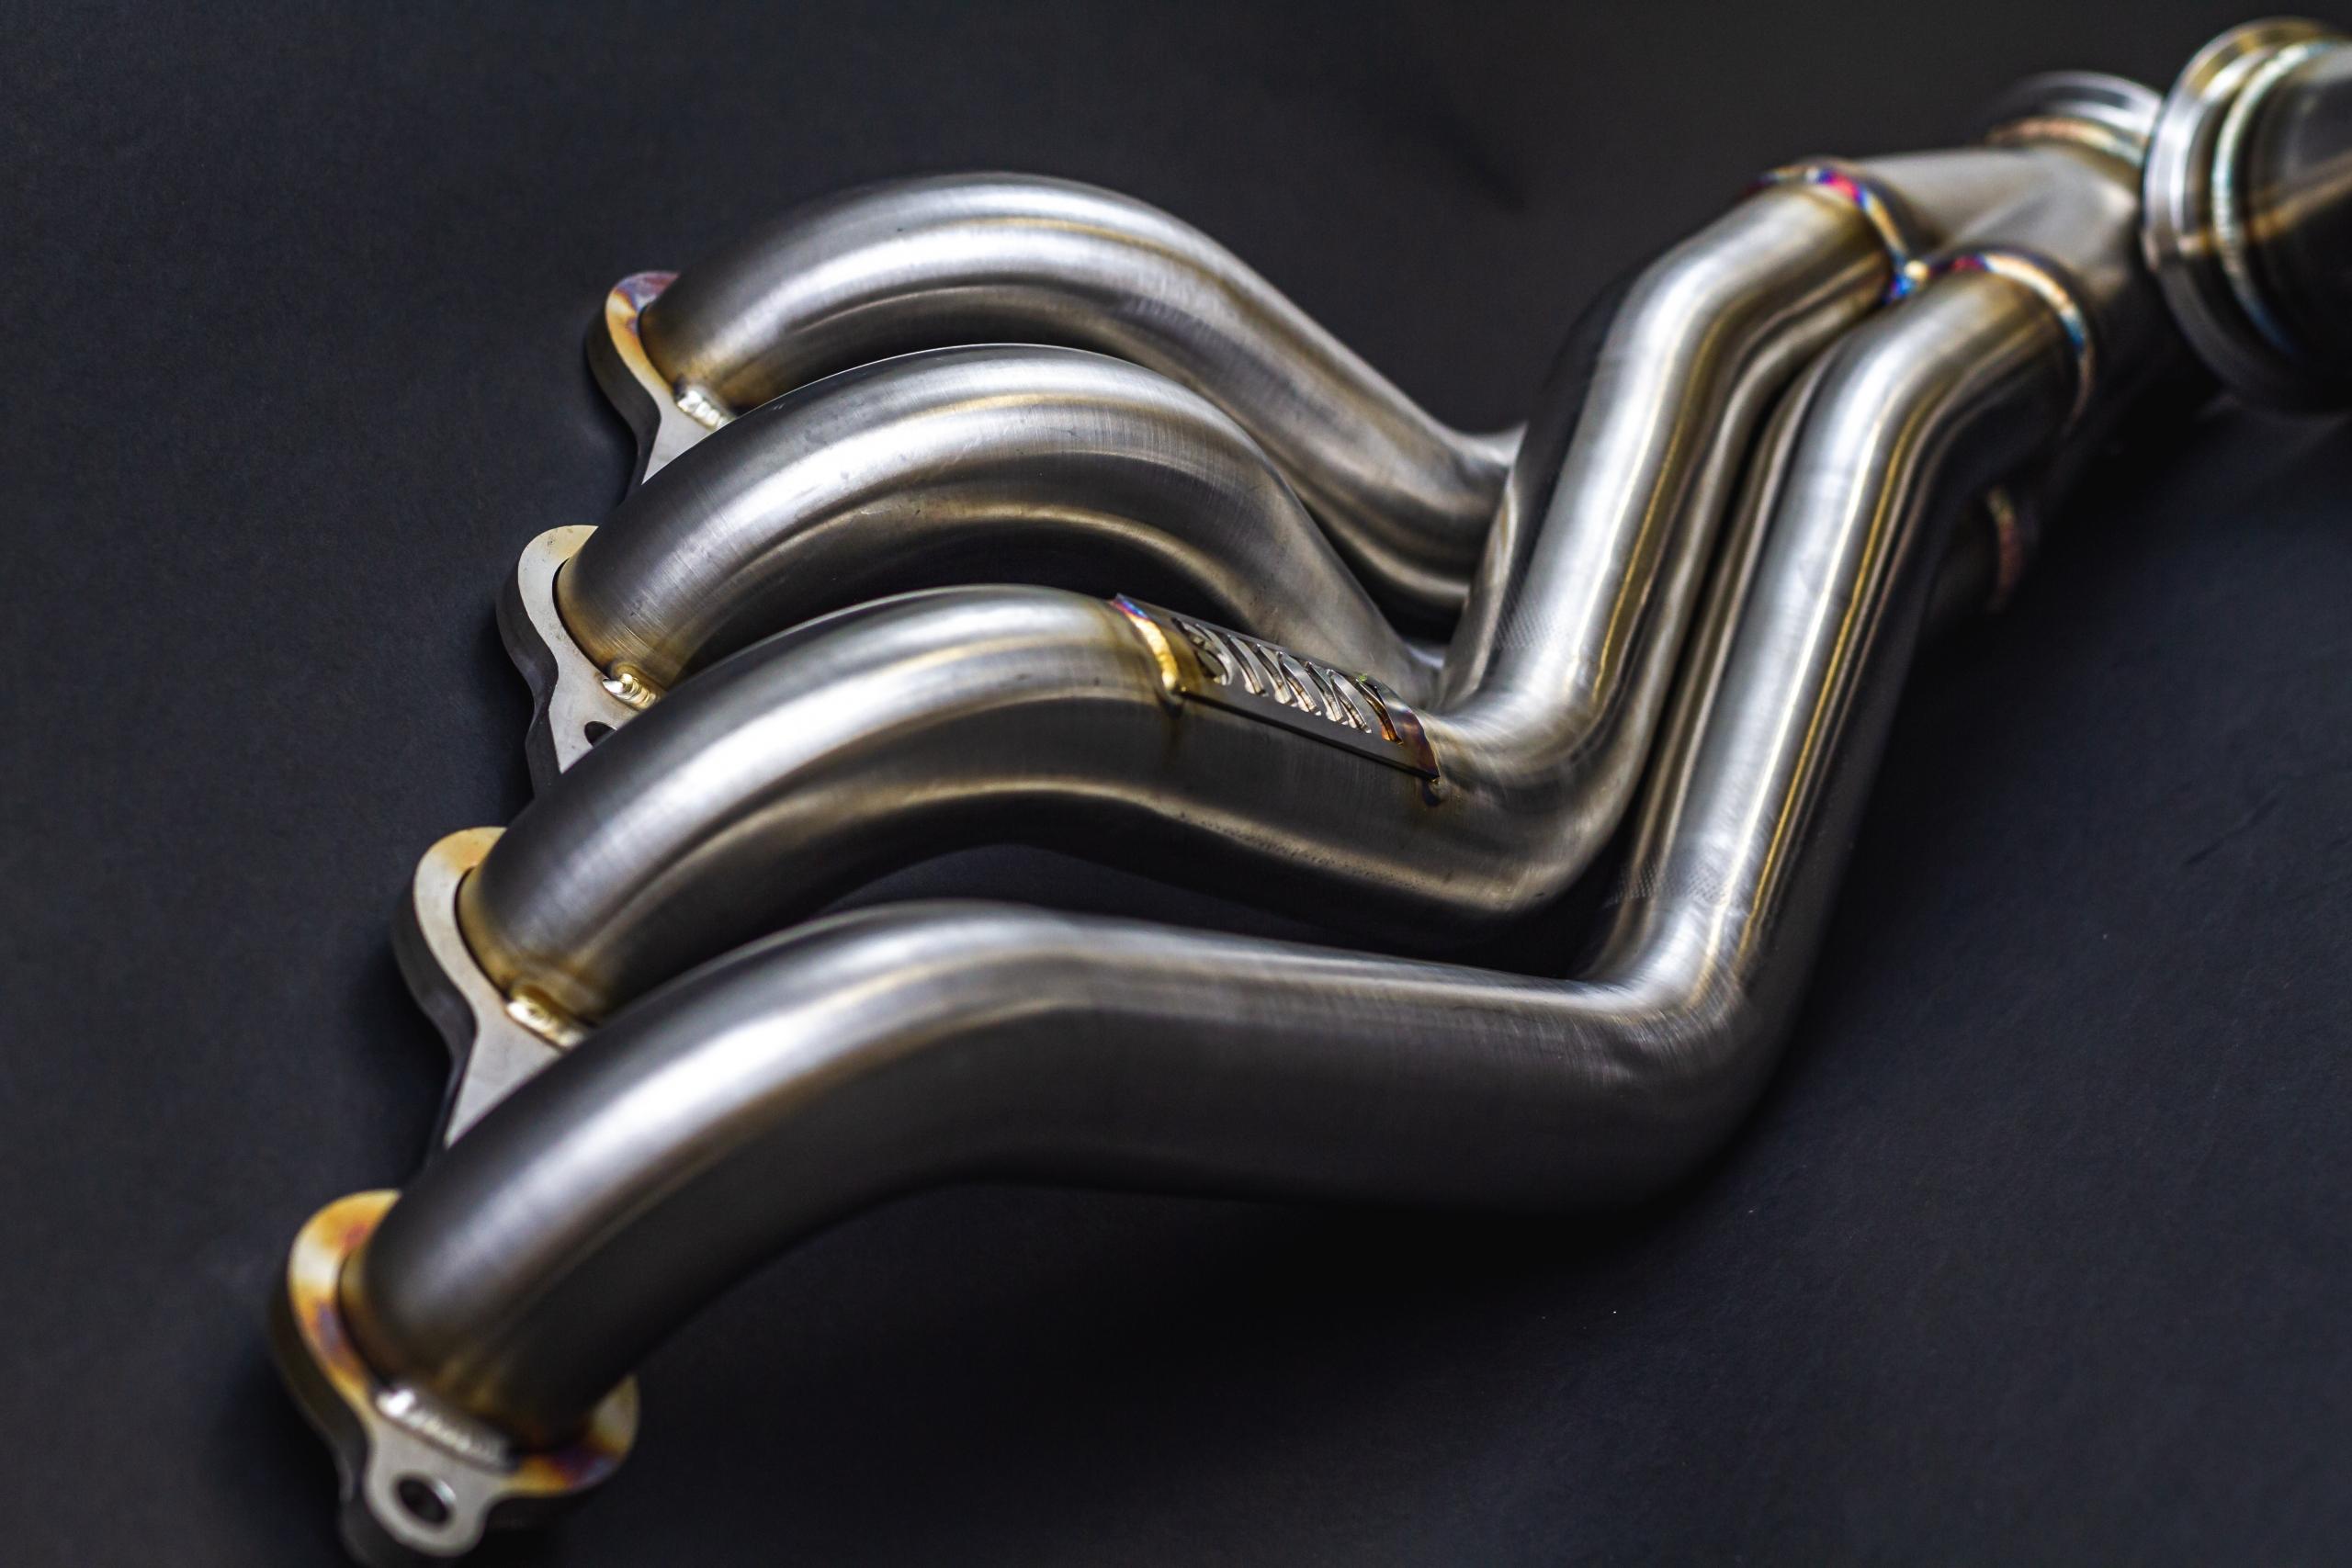 Sikky Infiniti G35 LS Swap Headers - Stainless Steel Pro Series